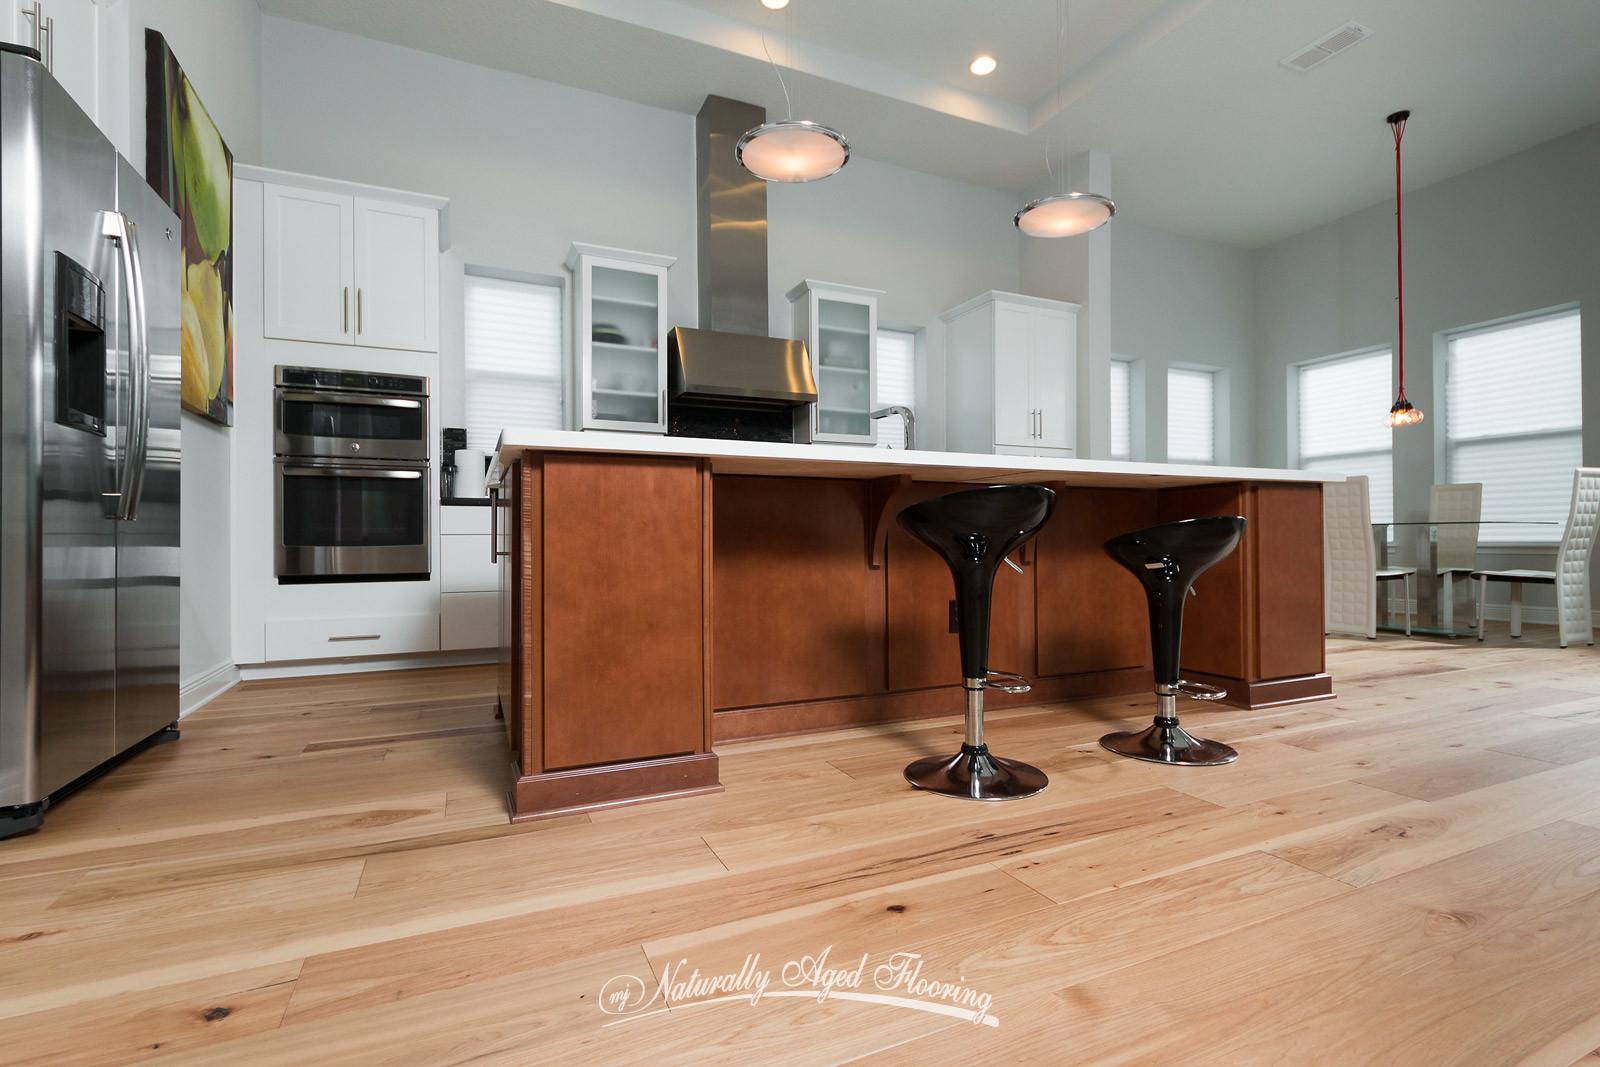 Sunset Hills Naturally Aged Flooring - Medallion flooring distributor